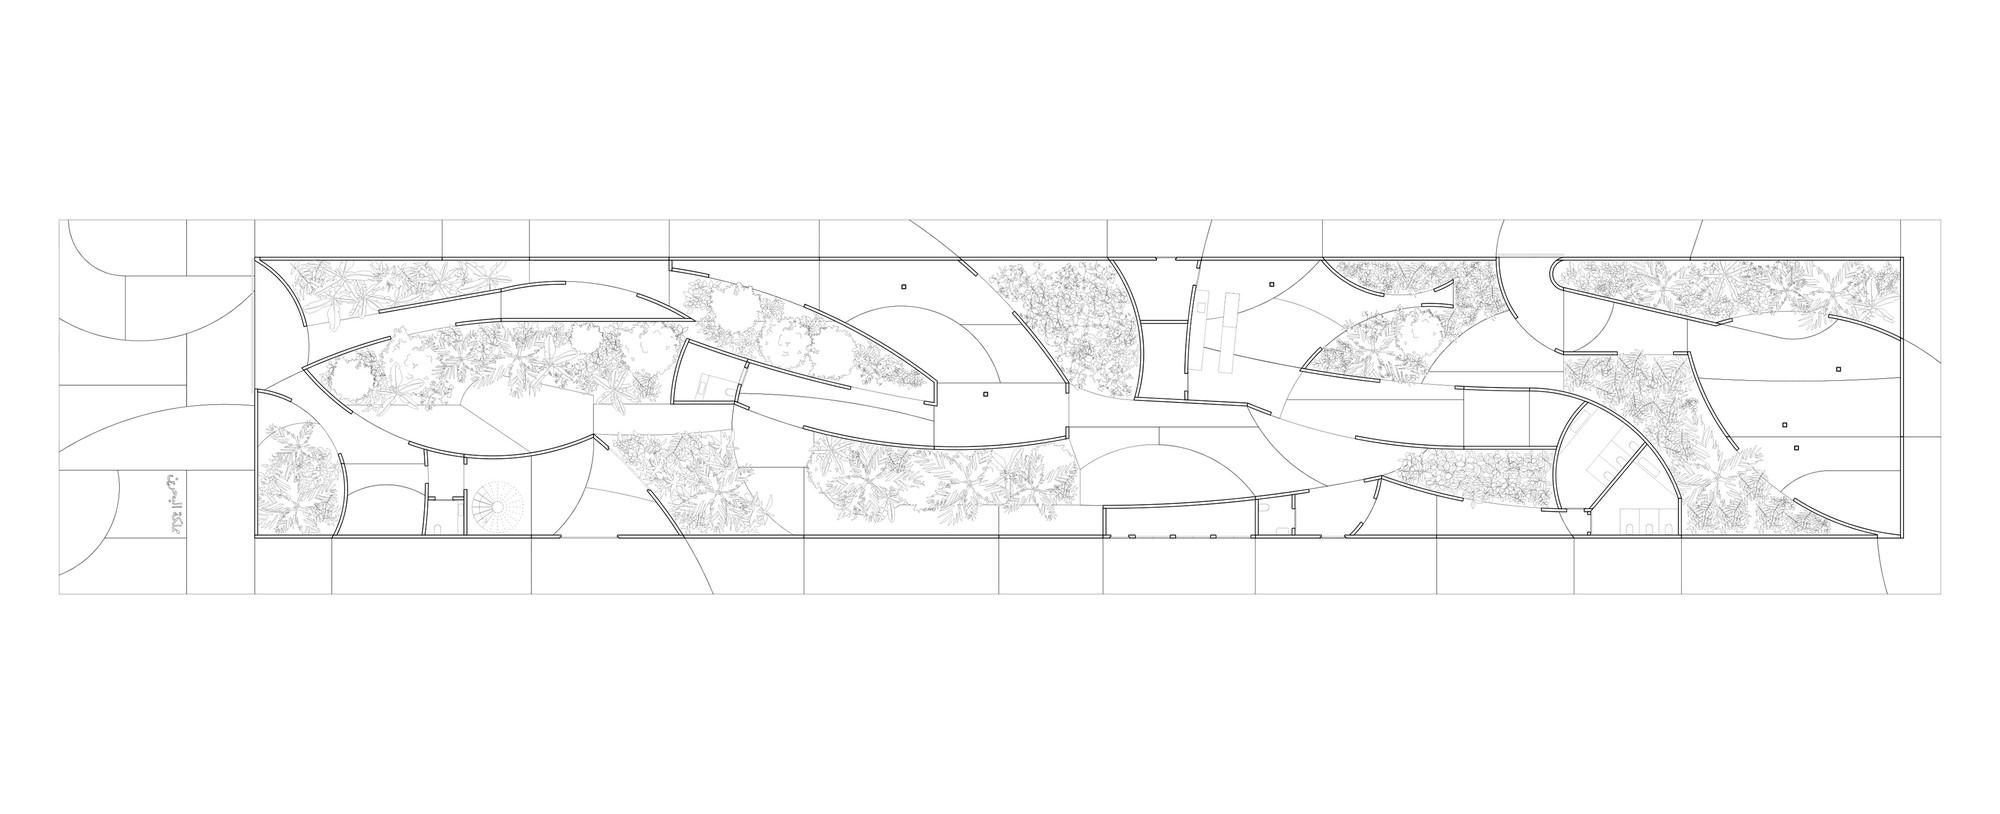 Bahrain Pavilion – Milan Expo 2015 - Floor Plan Via: Archdaily (http://www.archdaily.com/631908/bahrain-pavilion-expo-milano-2015-studio-anne-holtrop)